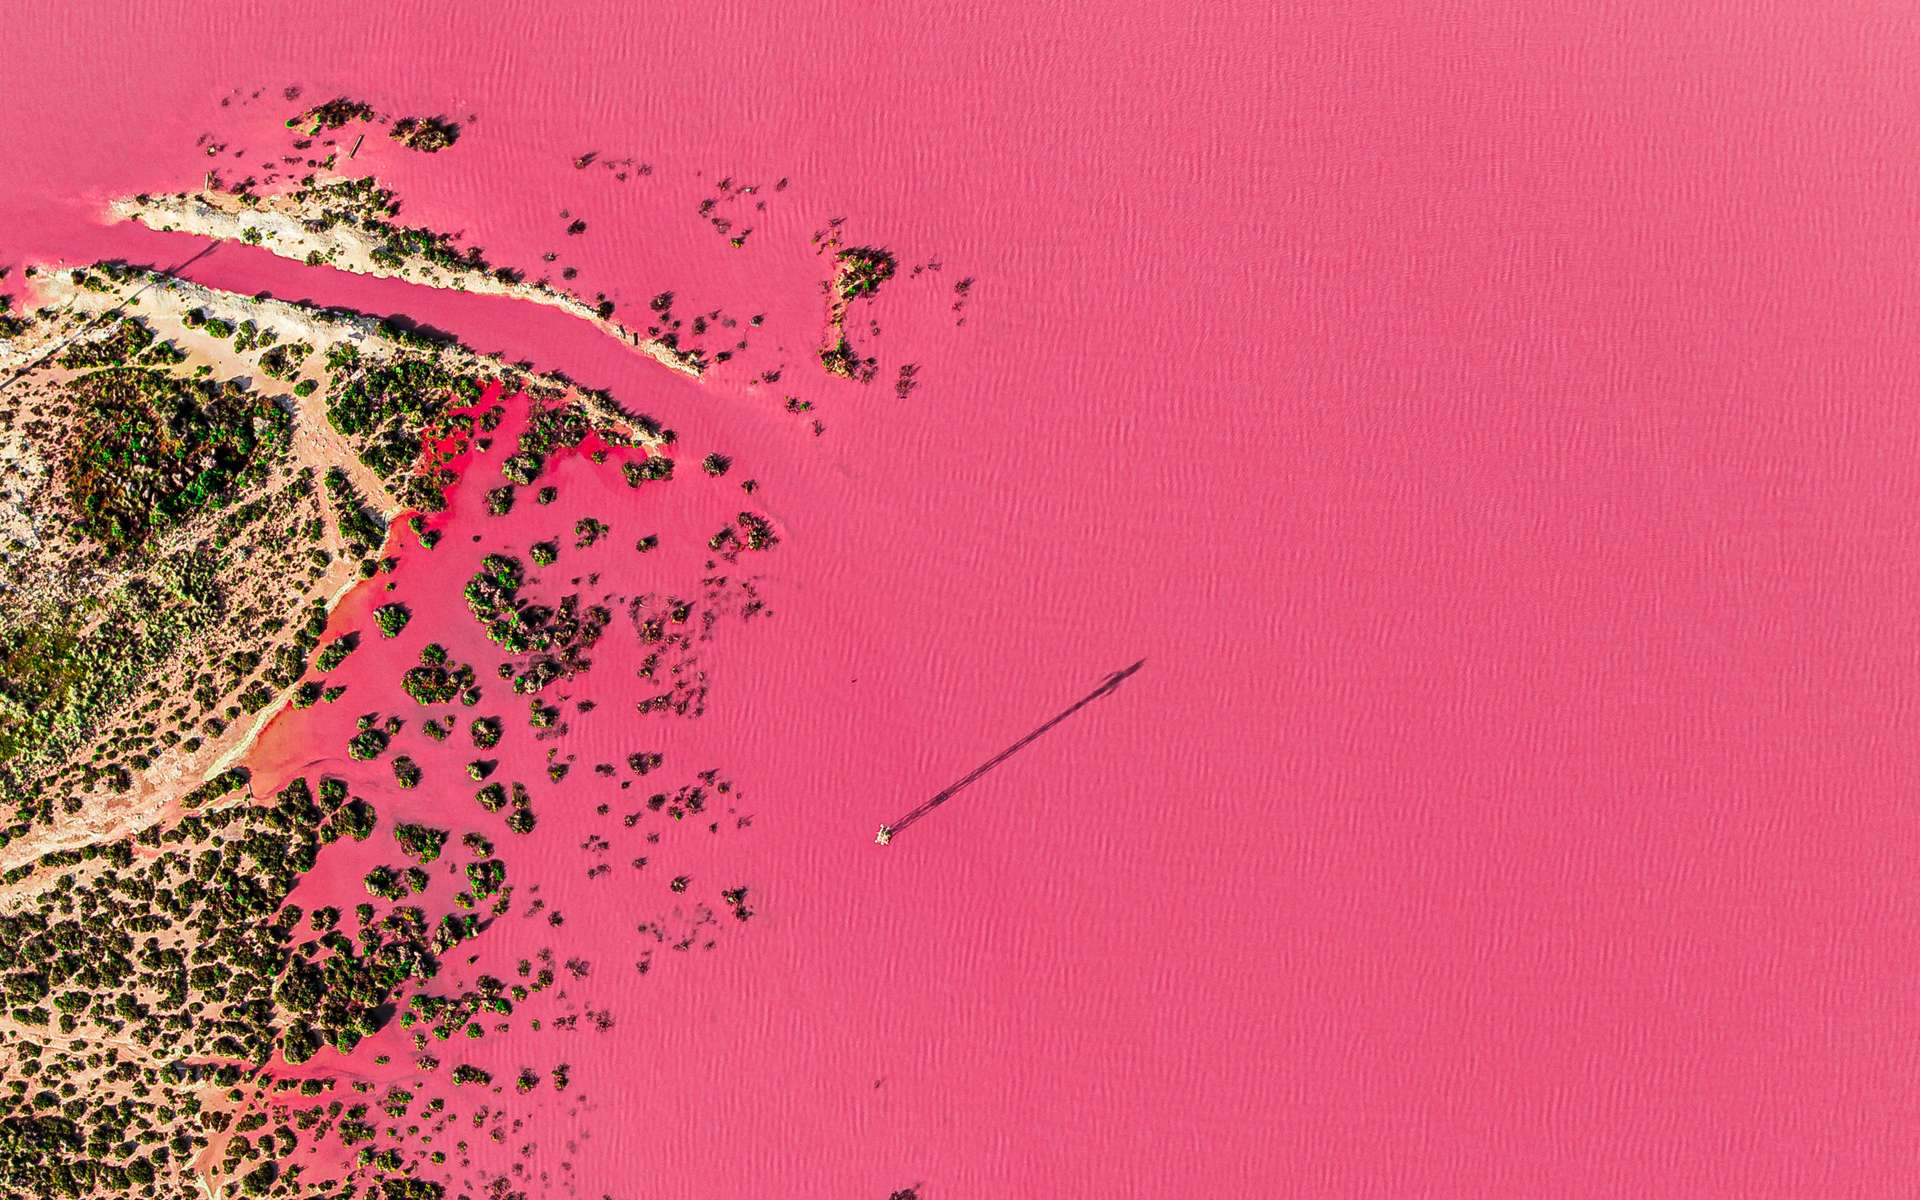 Magnifique lac naturellement rose situé à Torrevieja, Espagne. © iAmTasweer, Adobe Stock